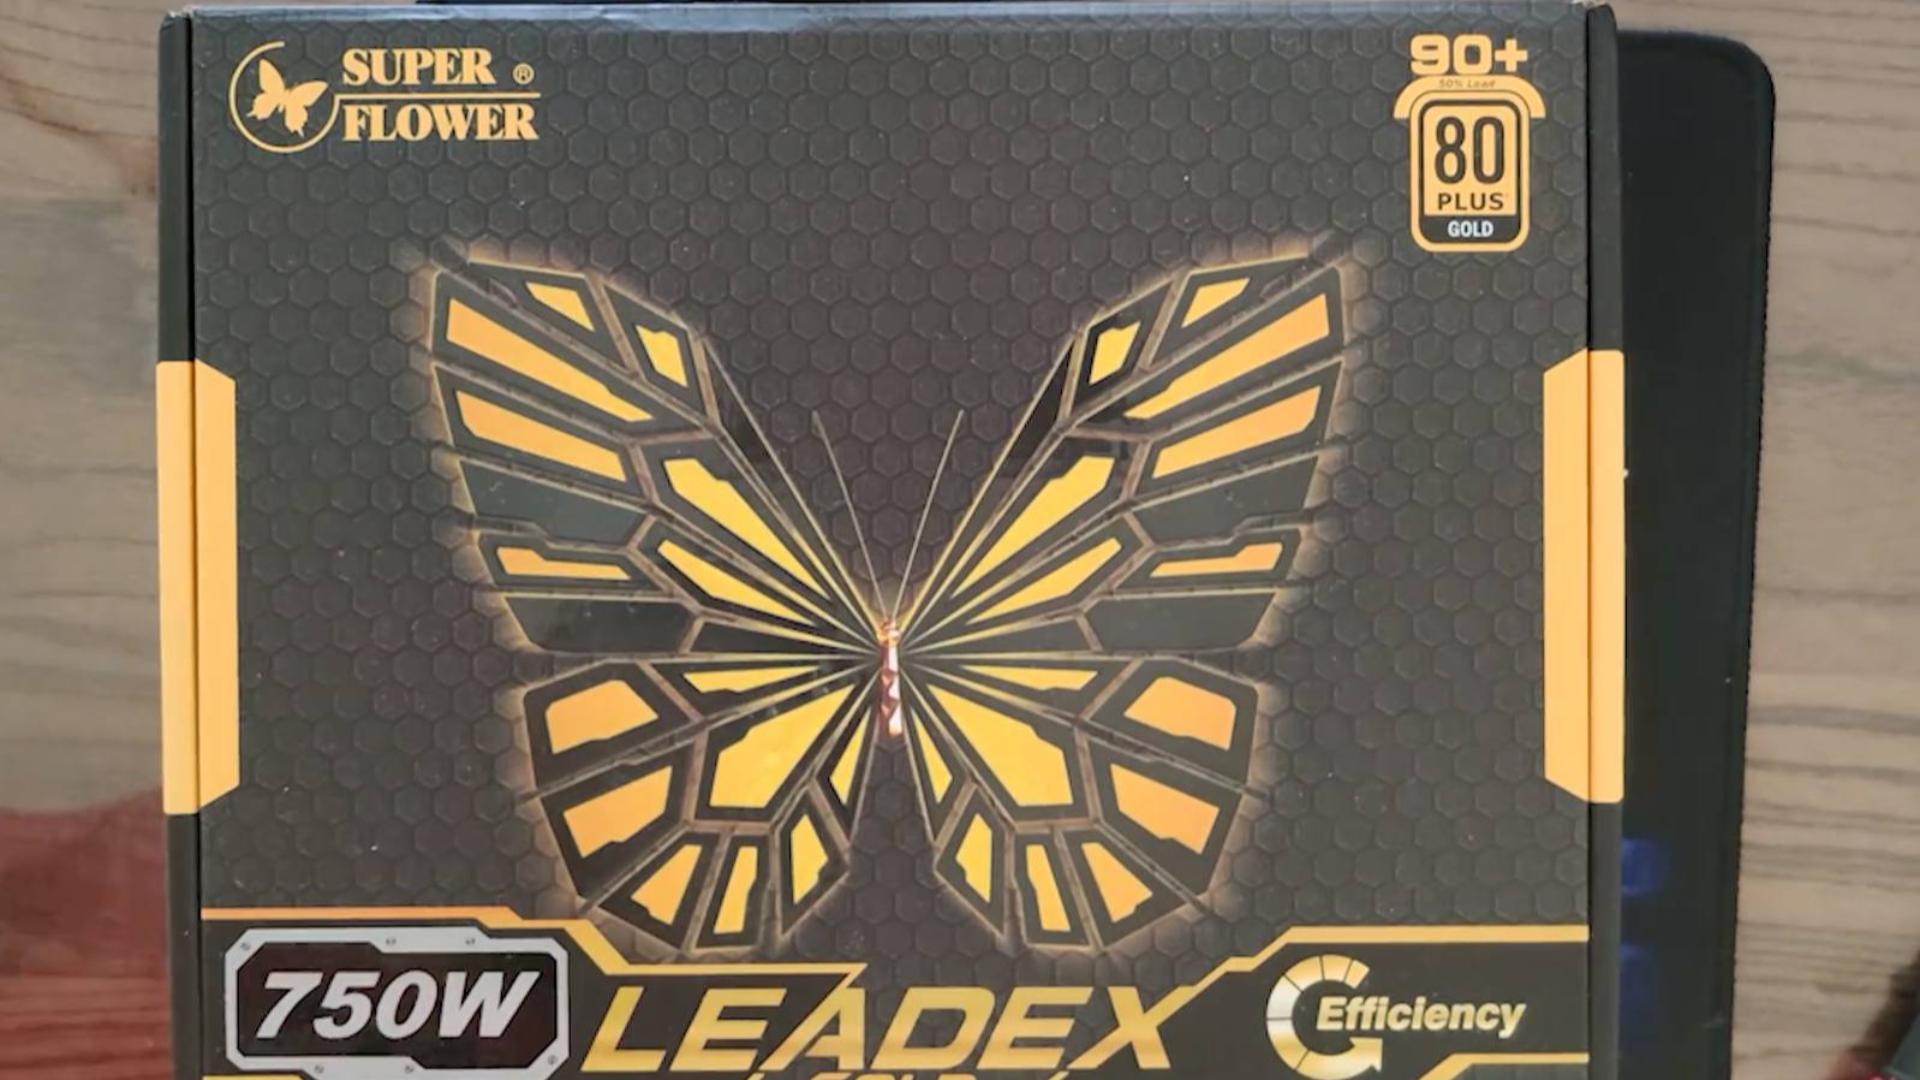 开箱上手振华电源 SUPER FLOWER 750W LEADEX